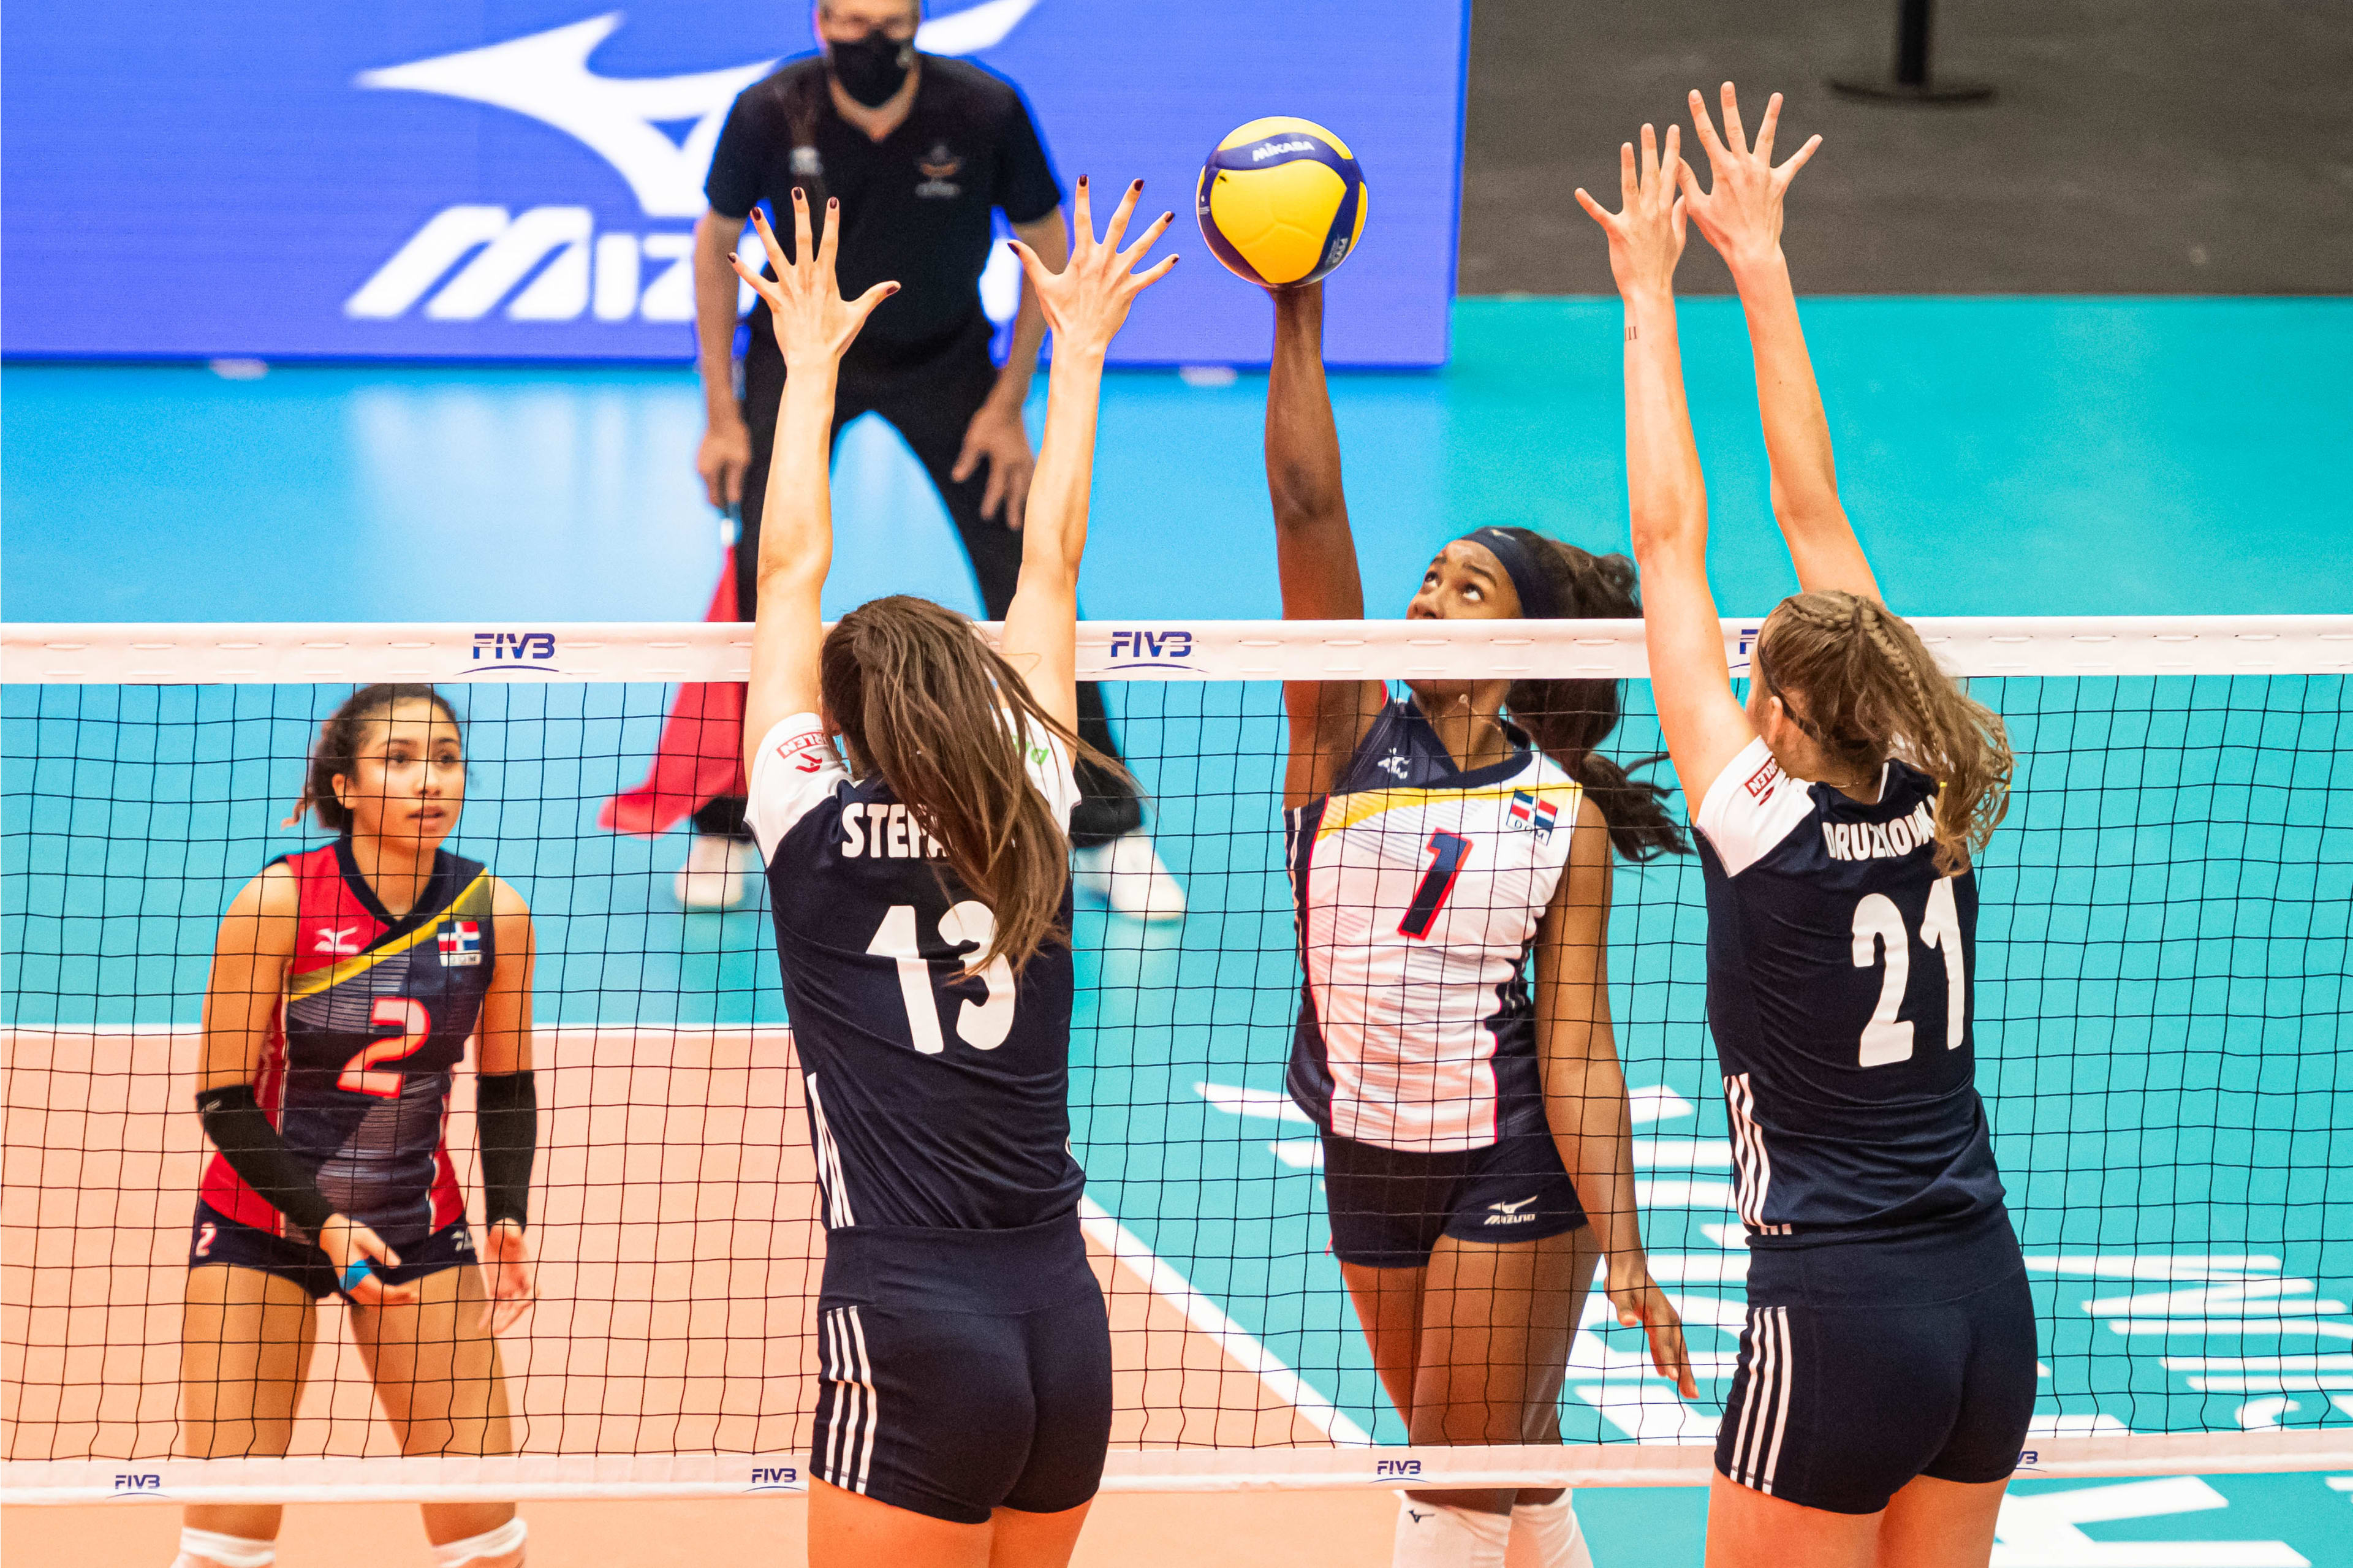 Voleibol femenino sub-20 cae ante sexteto de Polonia